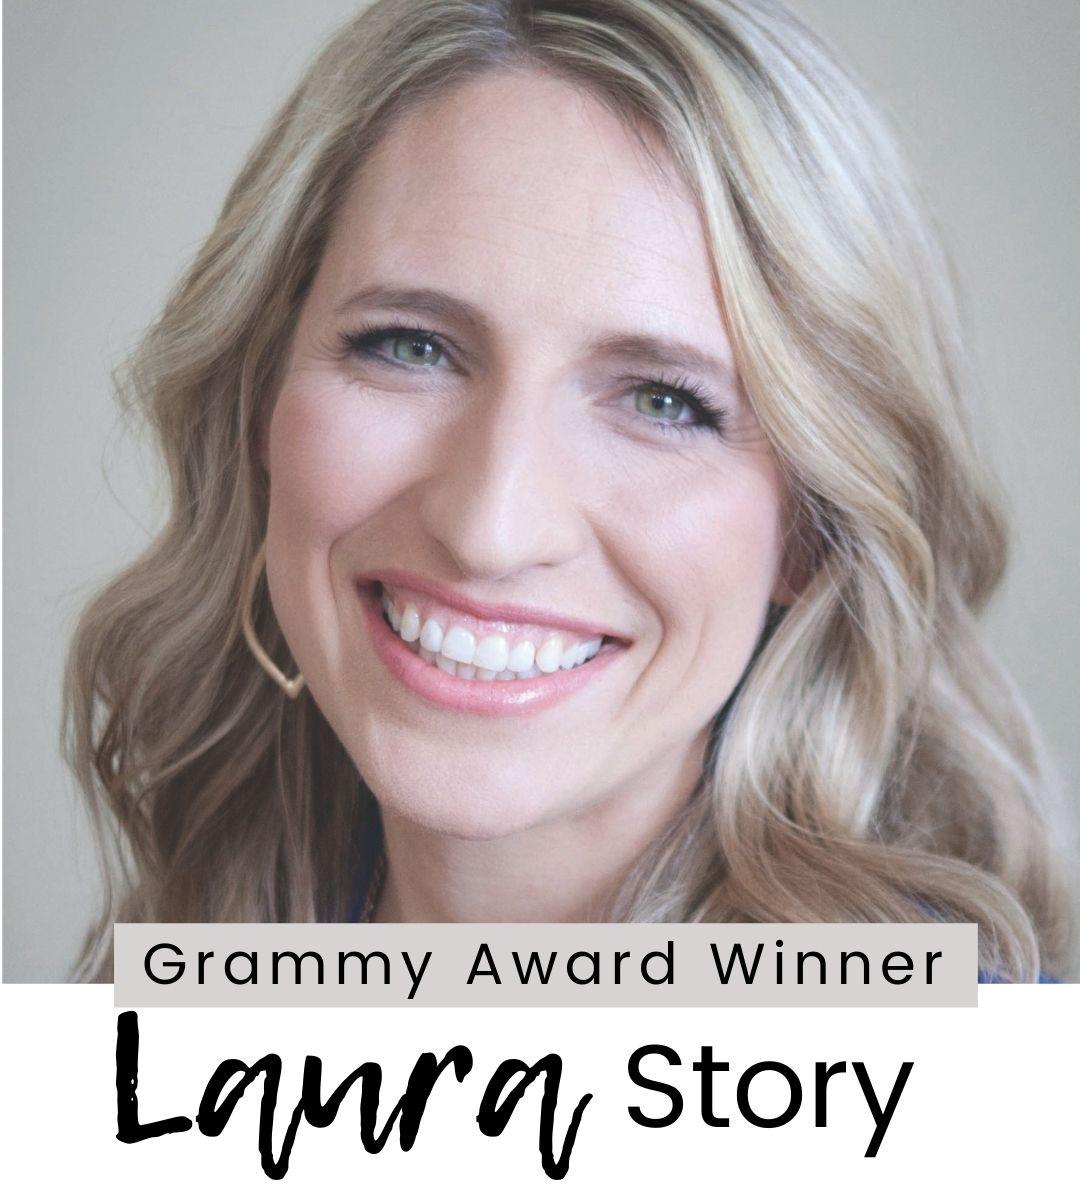 Laura_Story